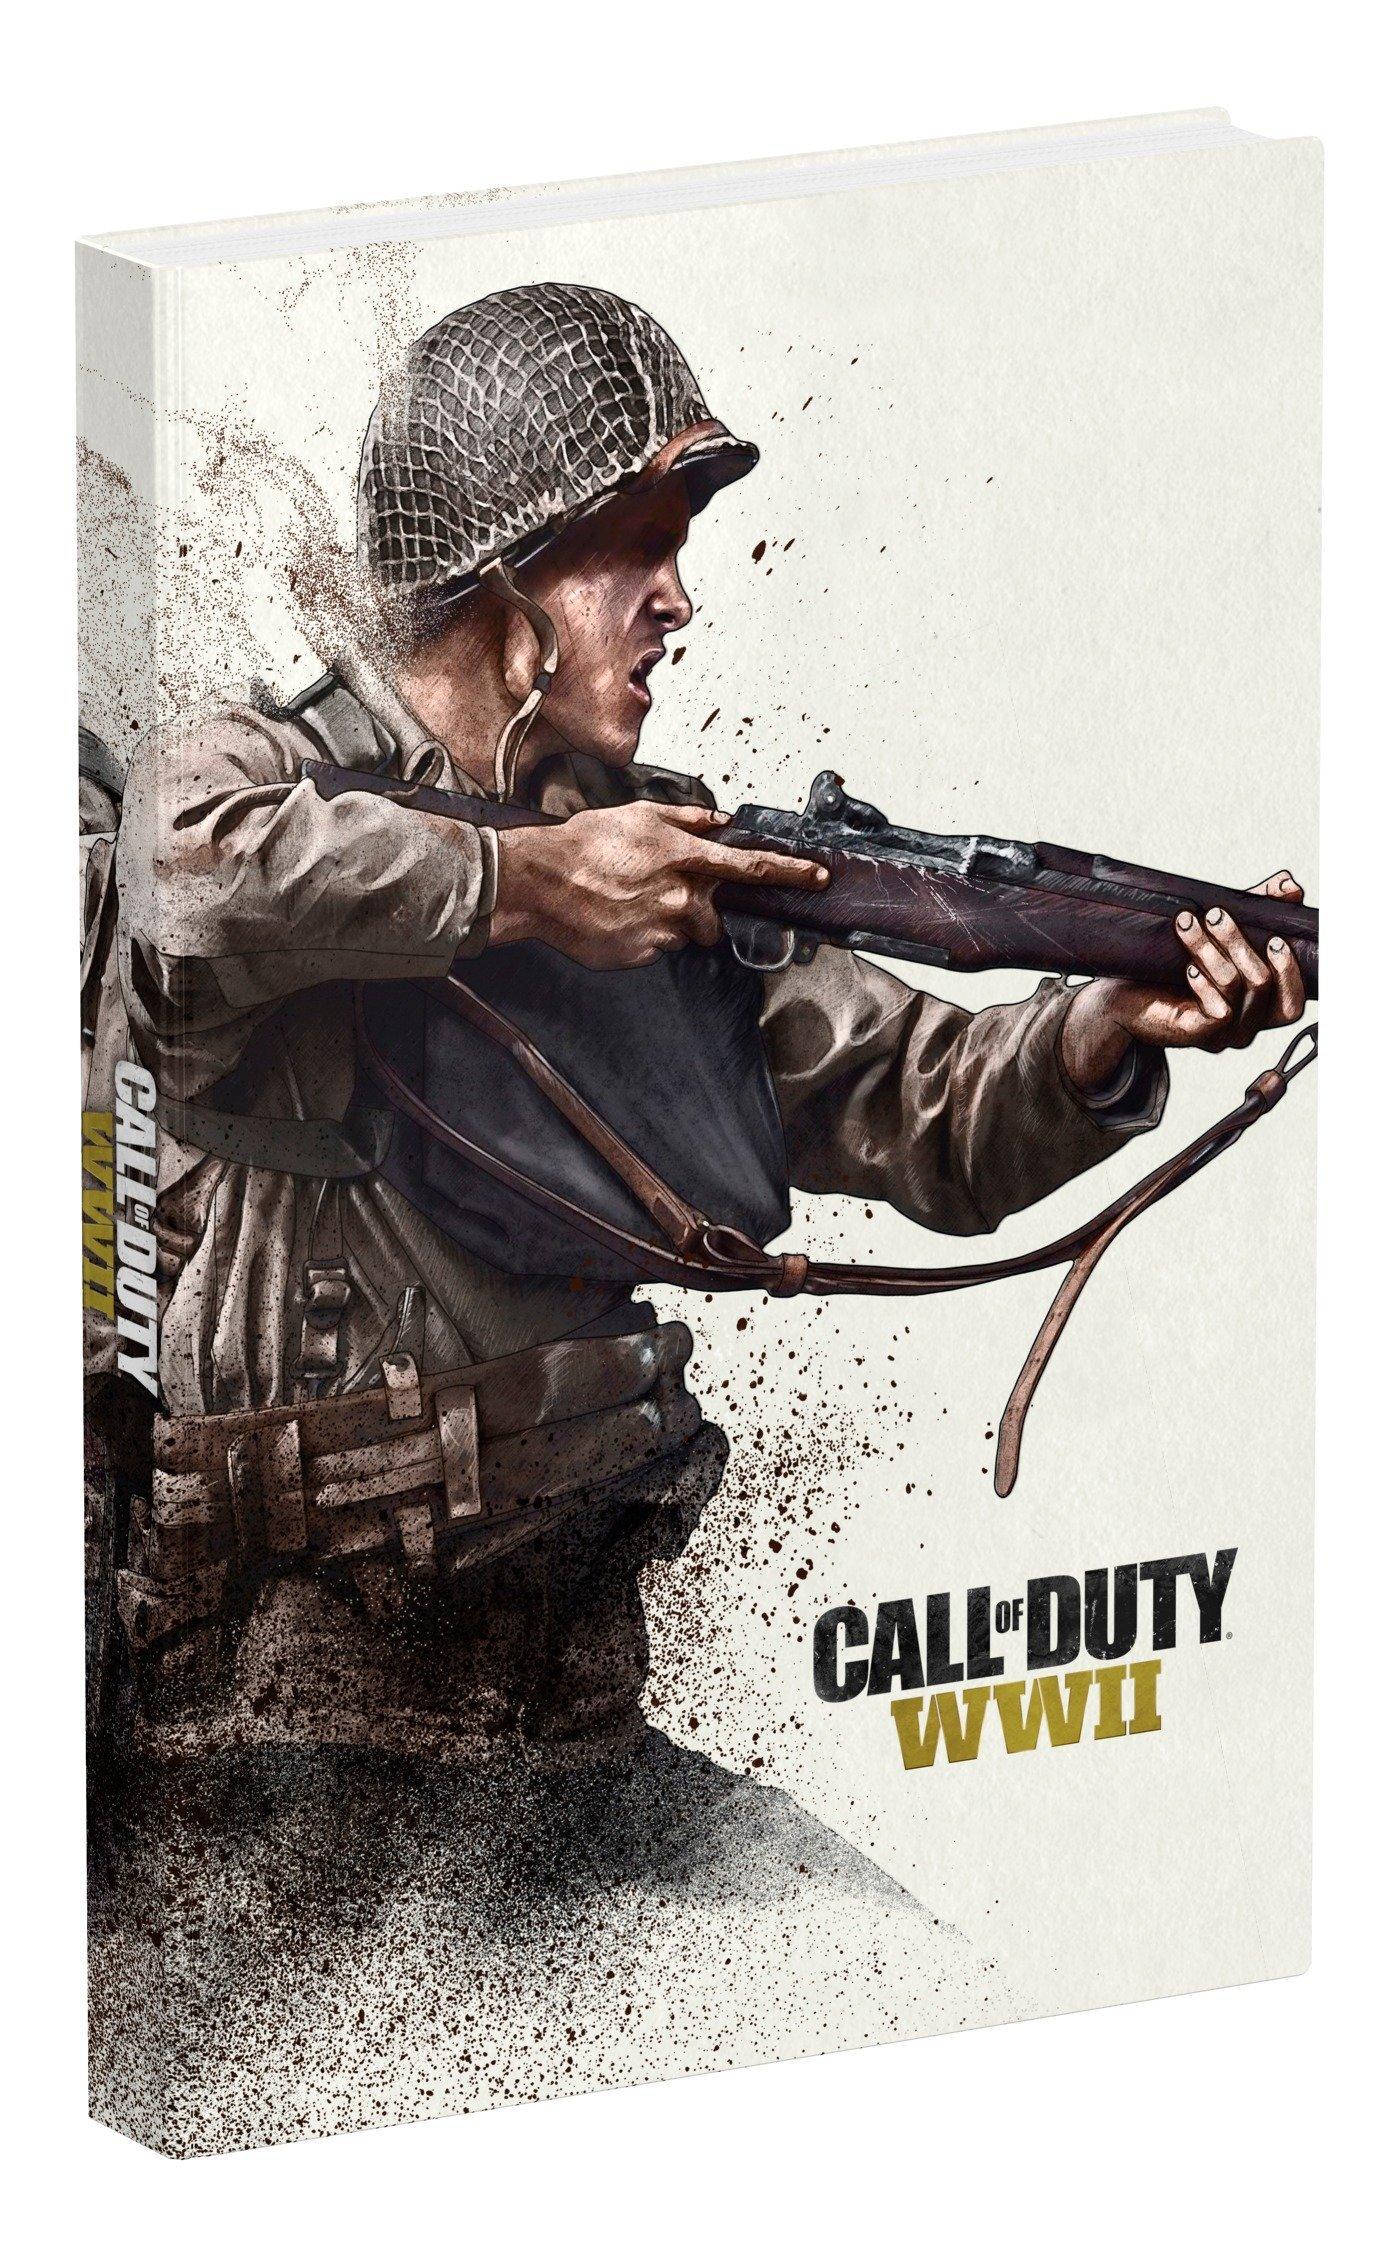 Call of Duty: WWII (Collectors Edition): Amazon.es: Prima Games ...